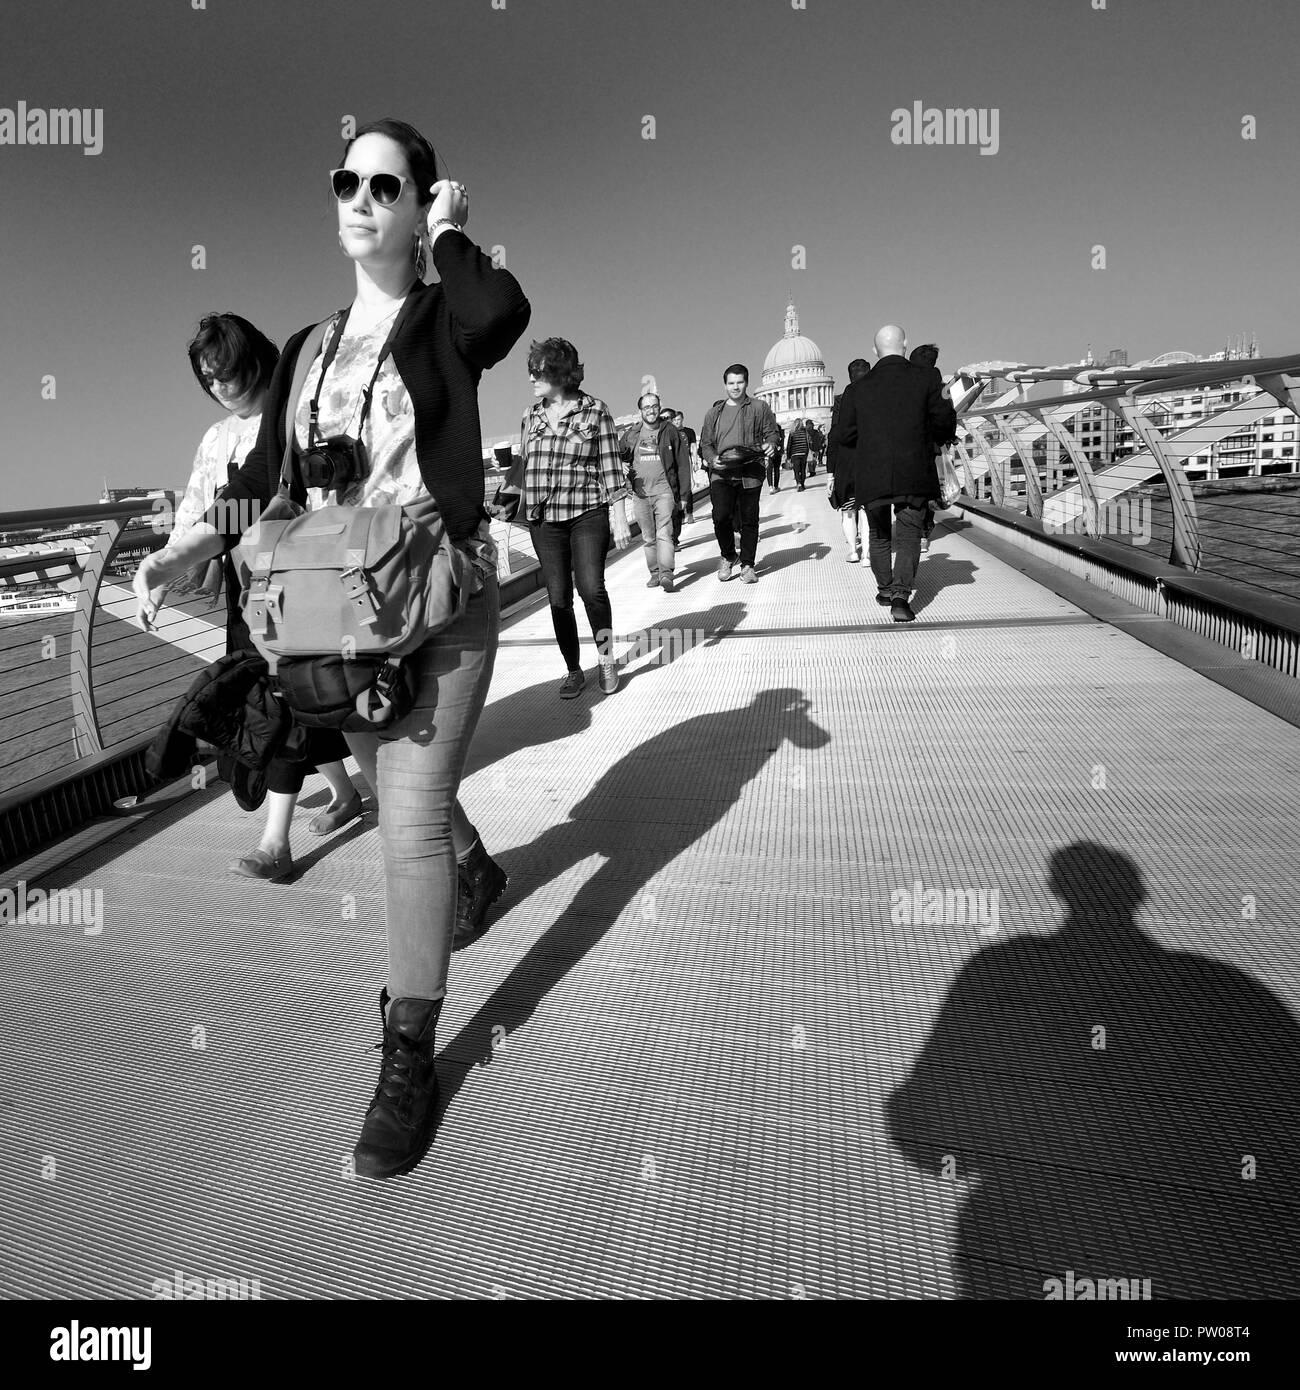 People crossing the Millennium Bridge, London, England, UK. - Stock Image